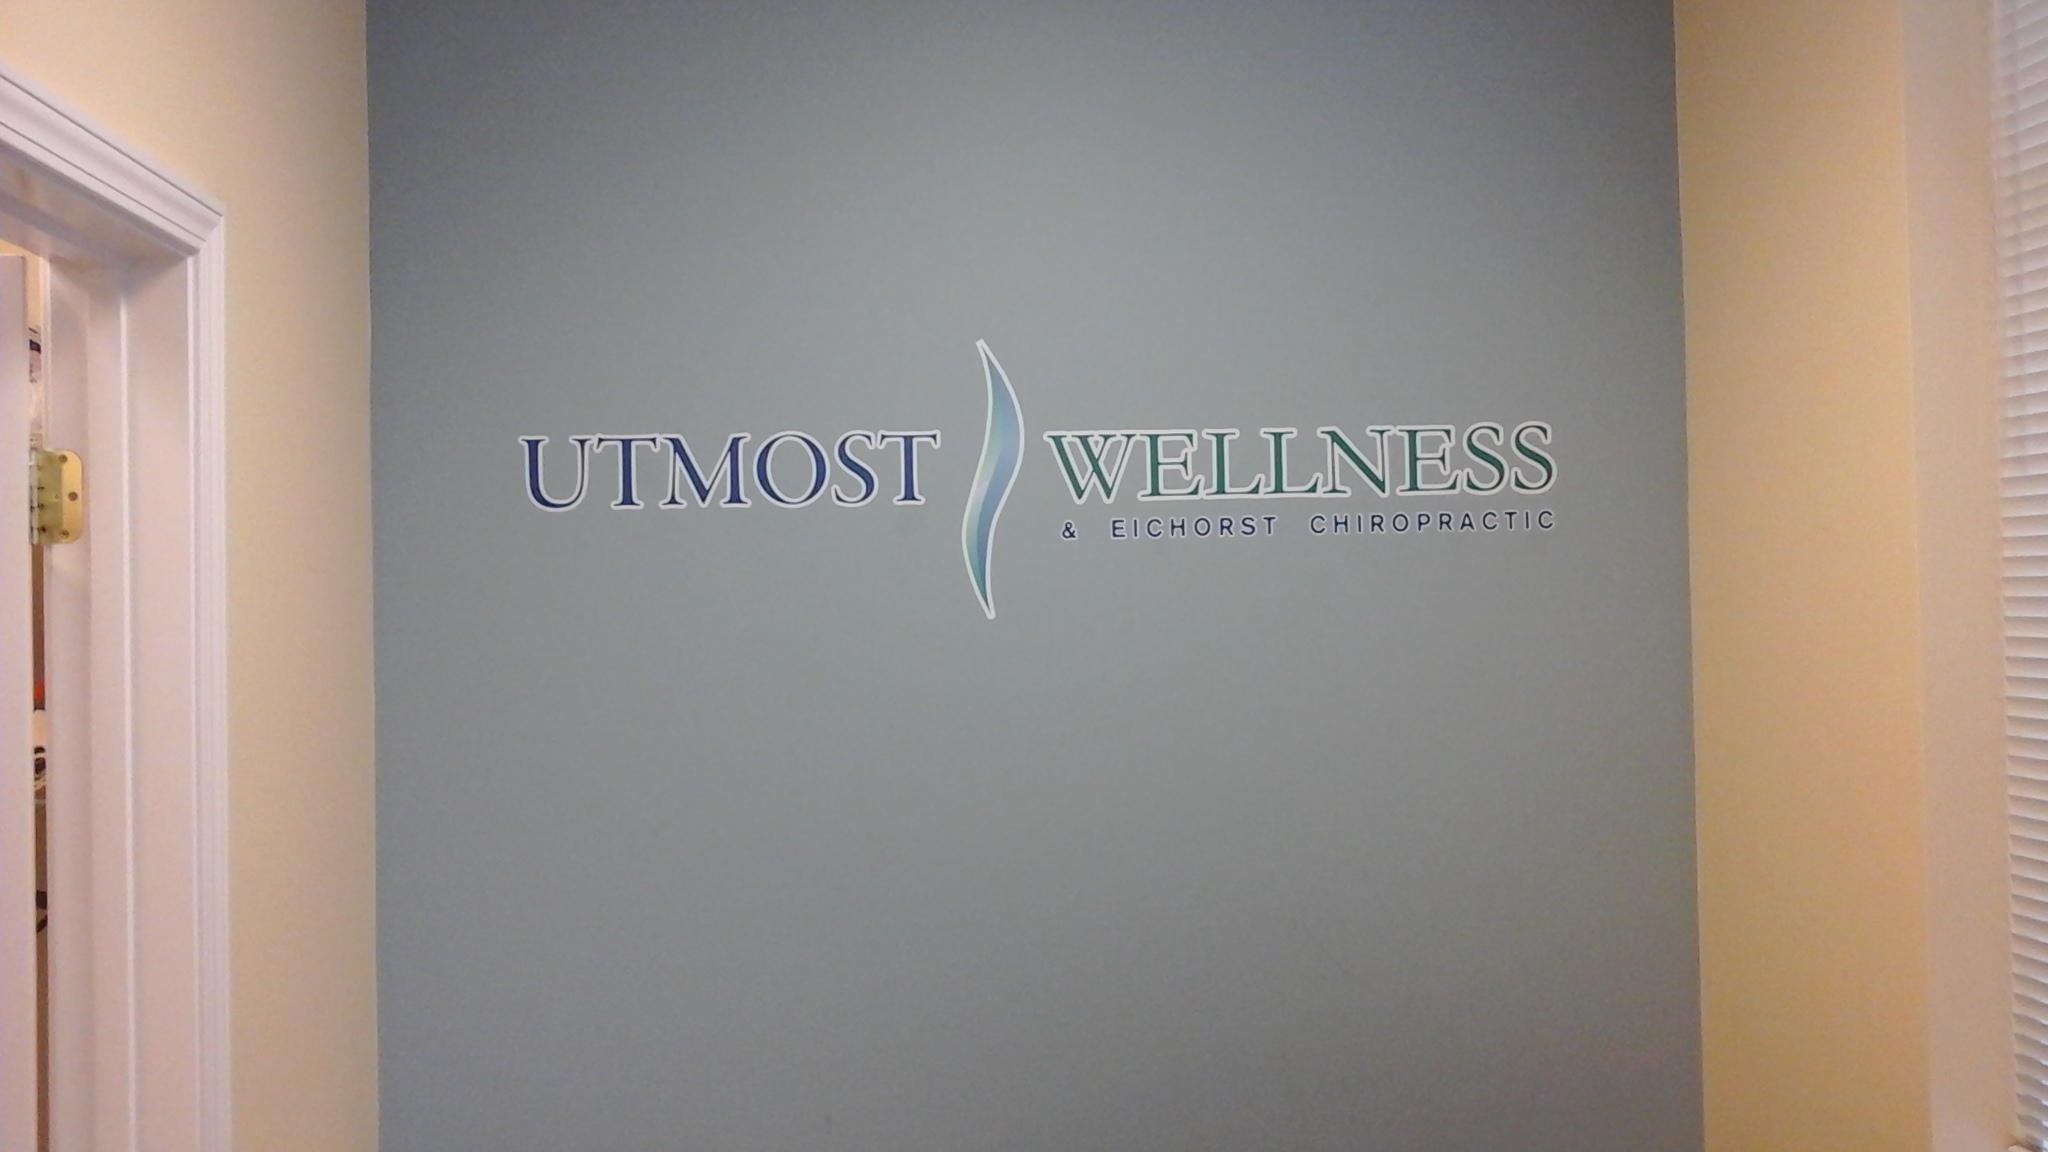 Utmost Wellness & Eichorst Chiropractic image 0